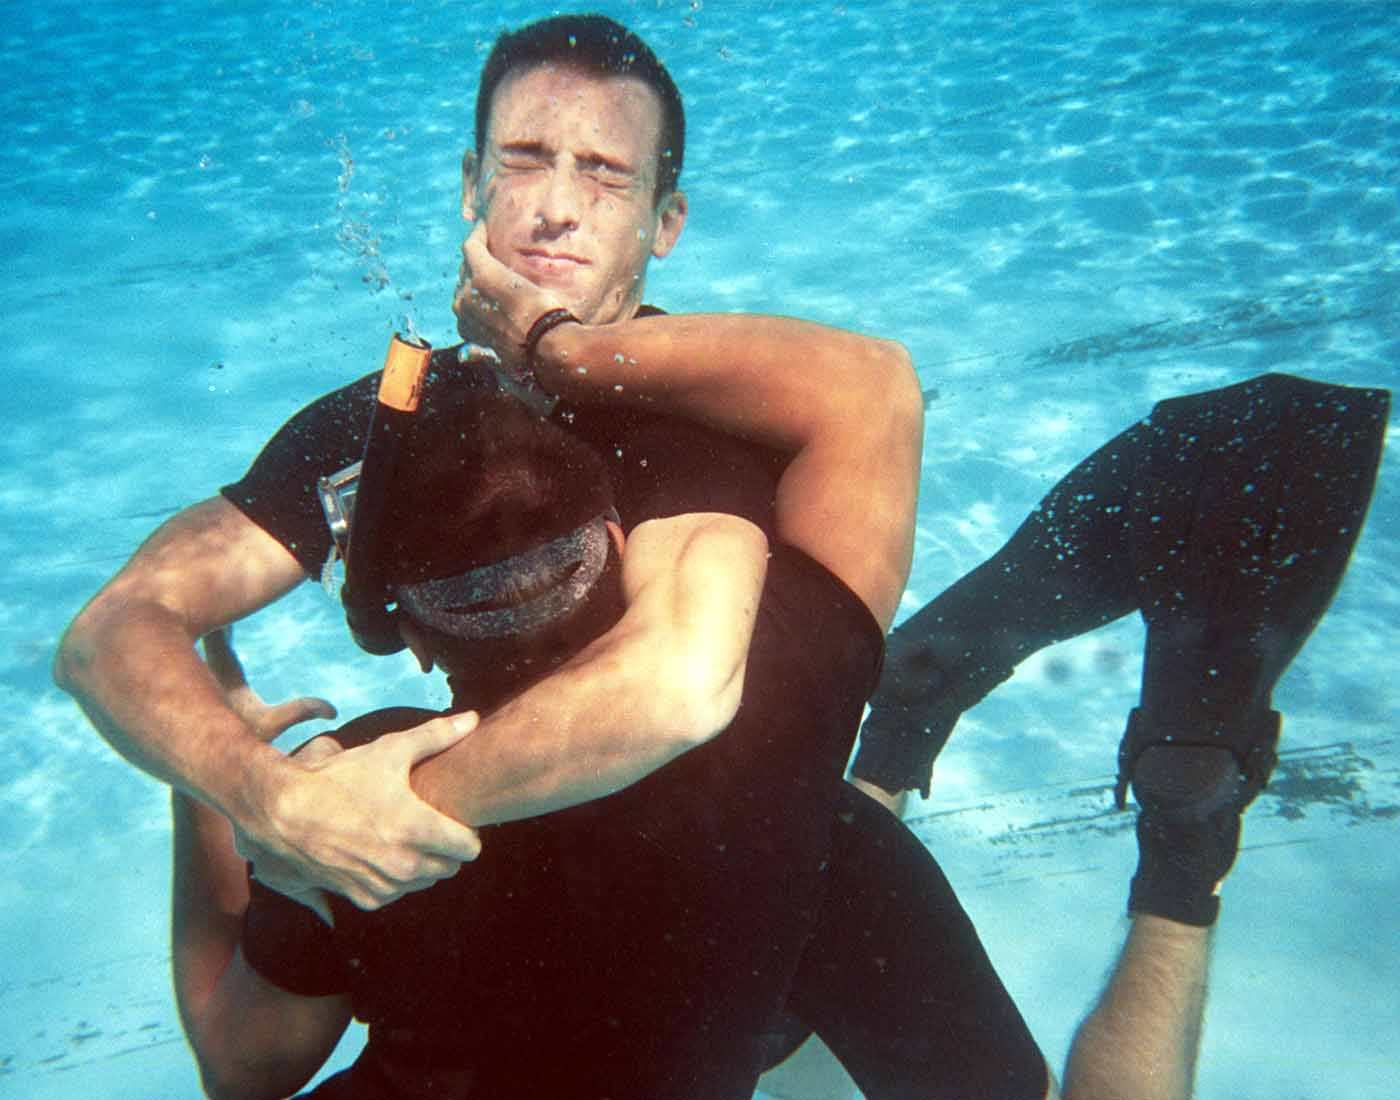 Underwater Wrestling or Aquathlon